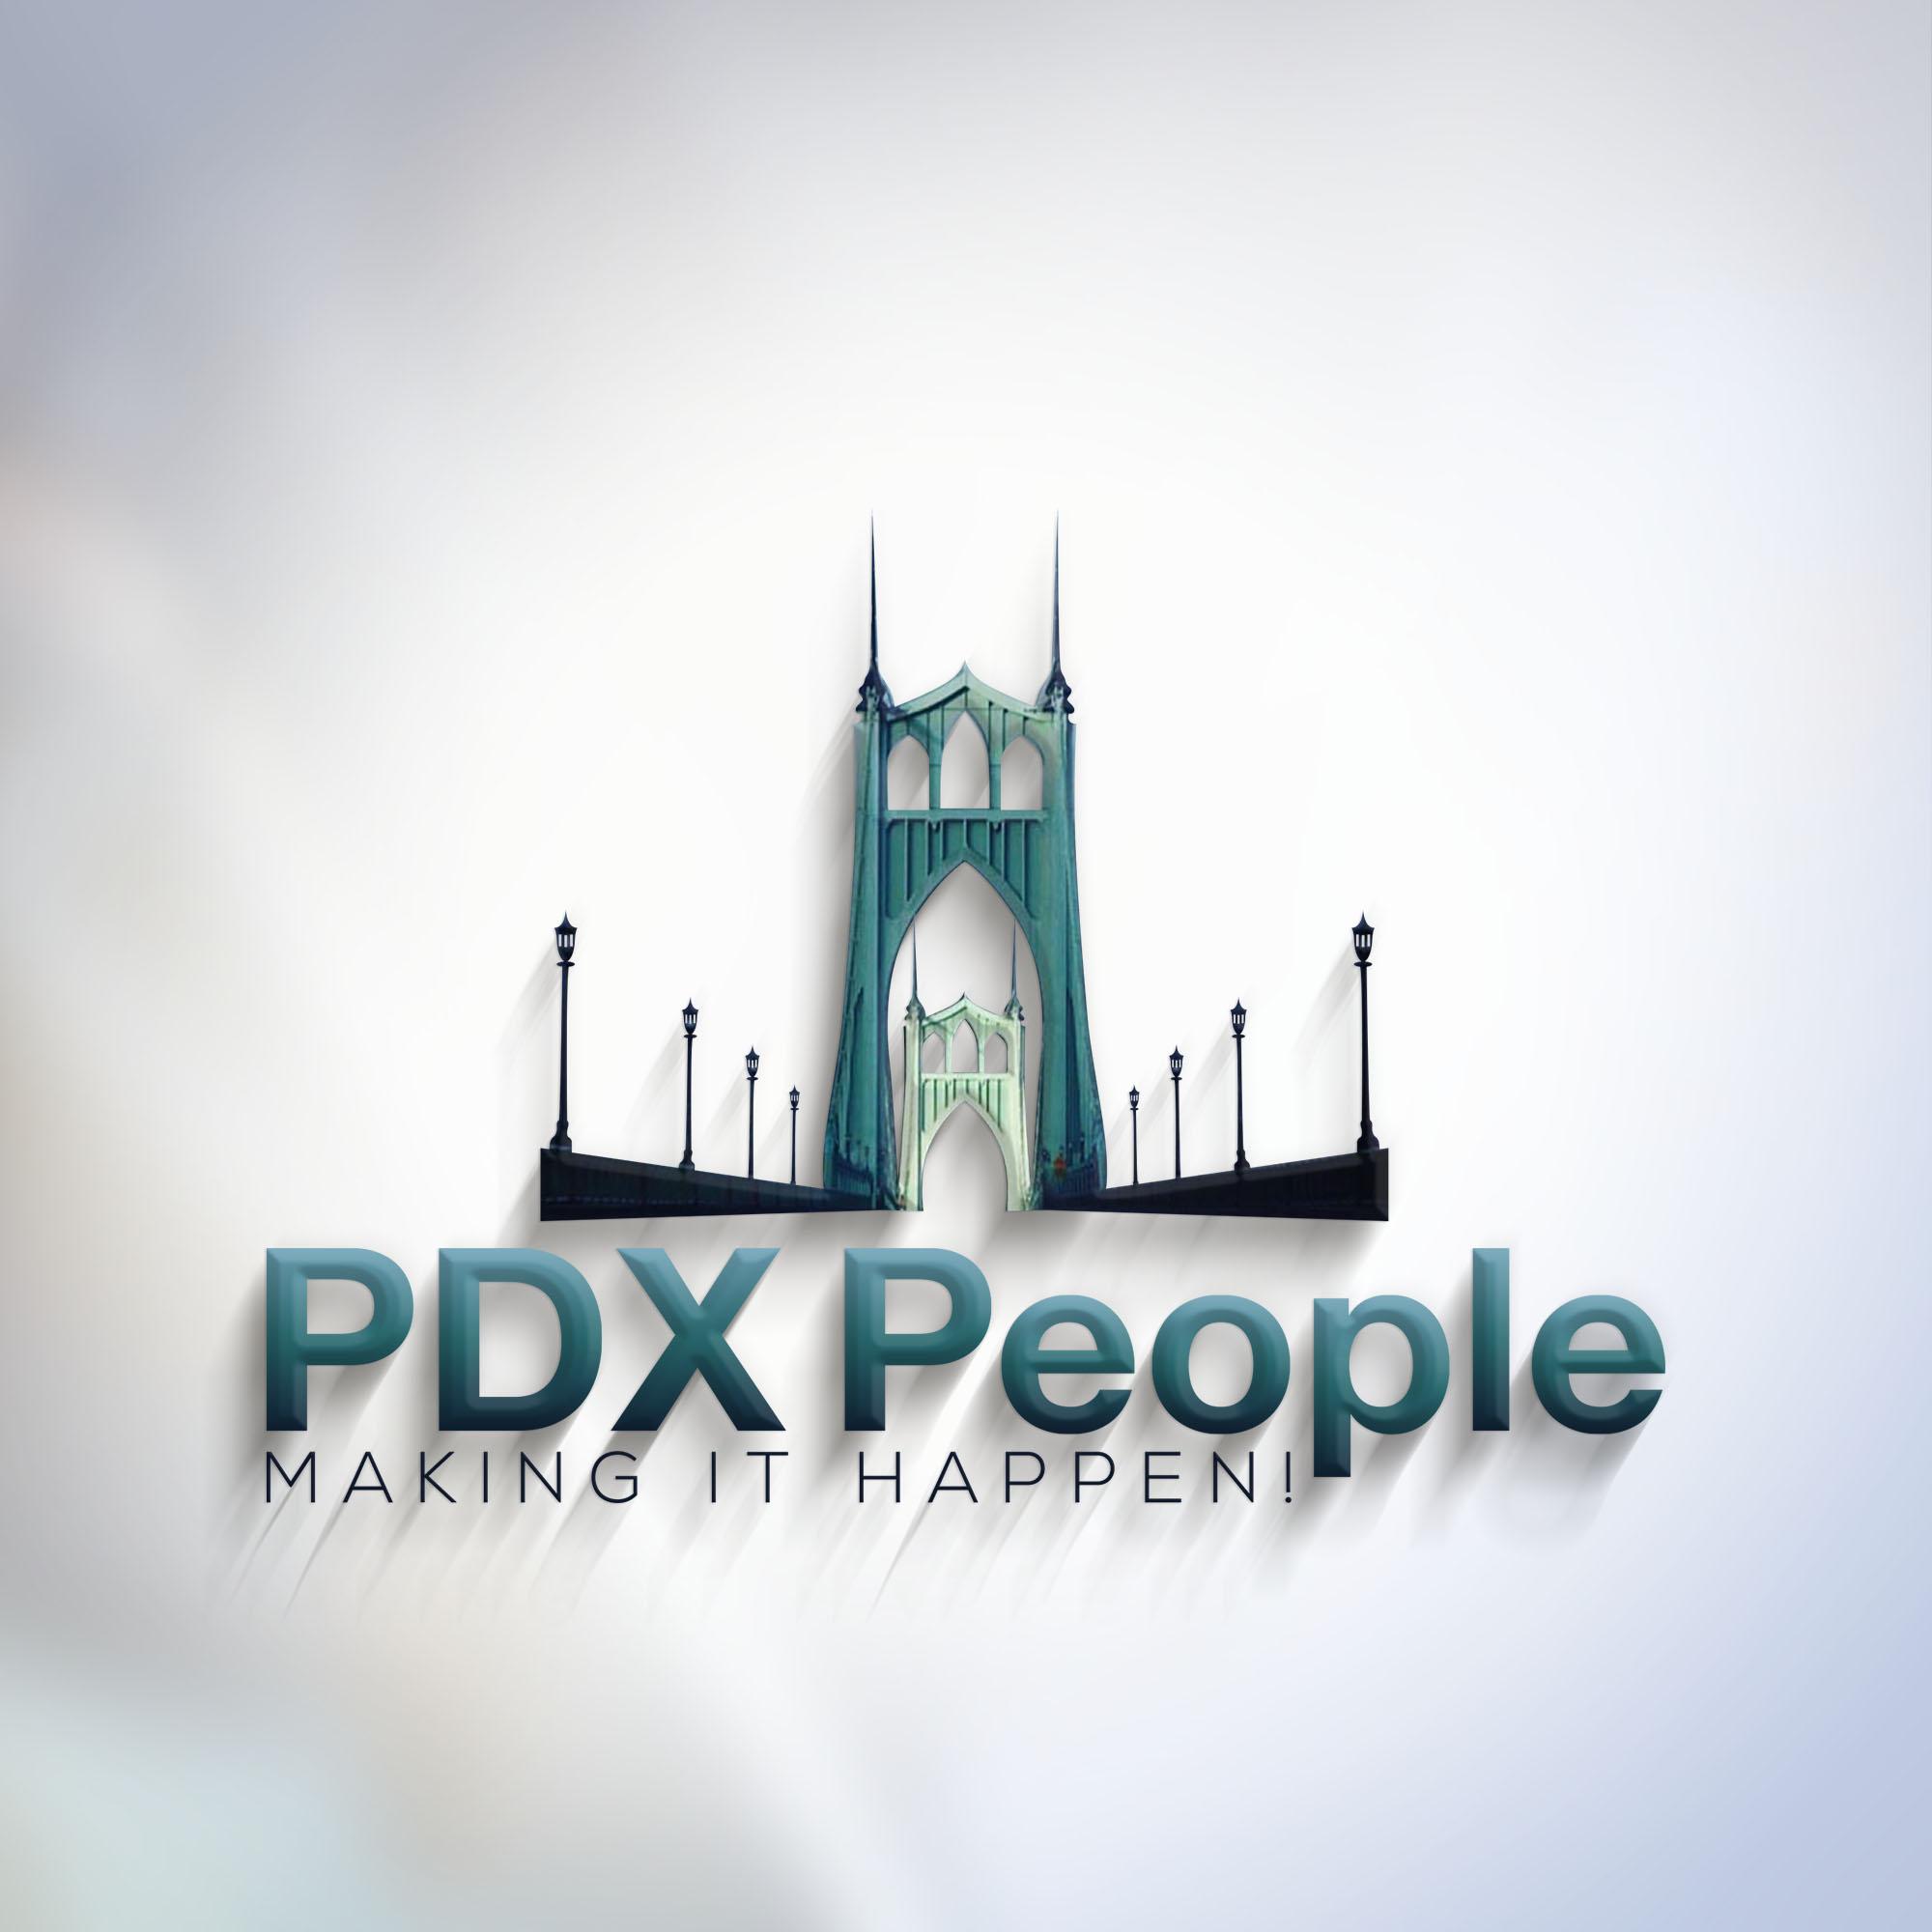 PDX People - St Johns Bridge